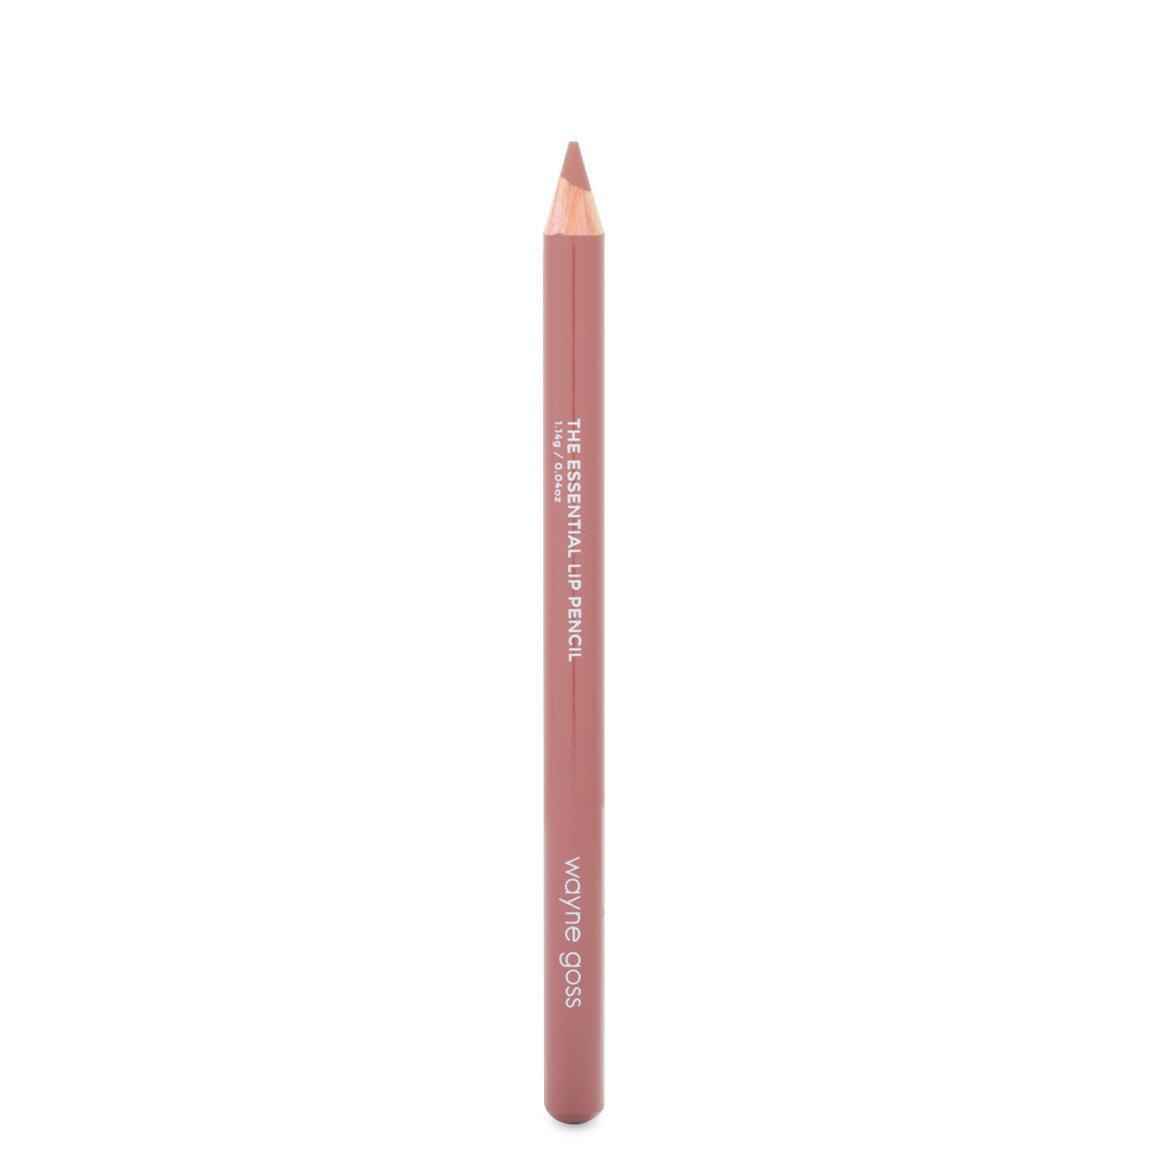 Wayne Goss The Essential Lip Pencil Sepia alternative view 1.